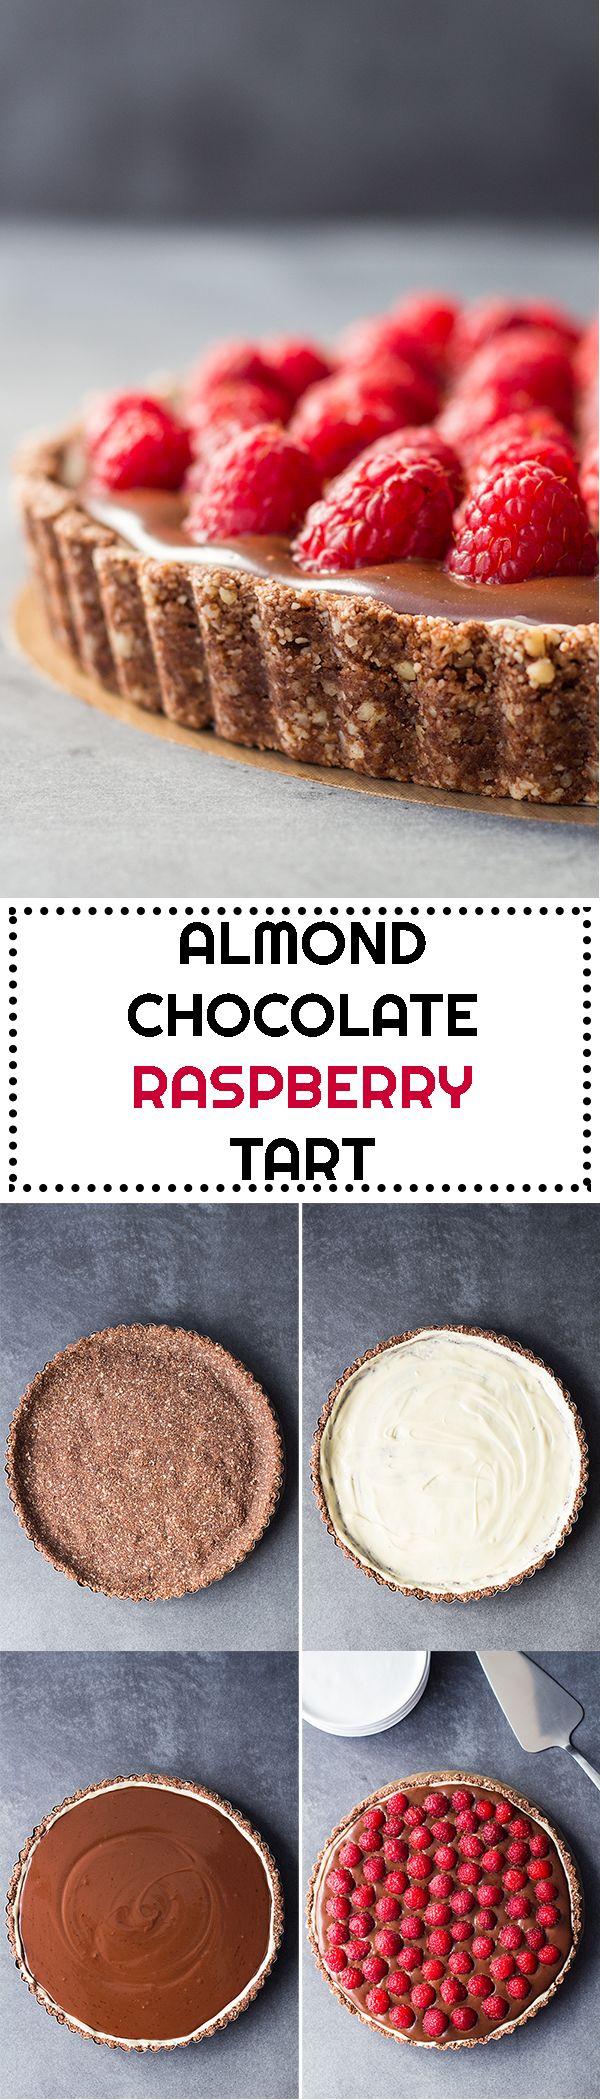 A gluten-free, refined-sugar-free, delicious Almond Chocolate Raspberry Tart made with a vegan almond crust and vegan dark chocolate cream.